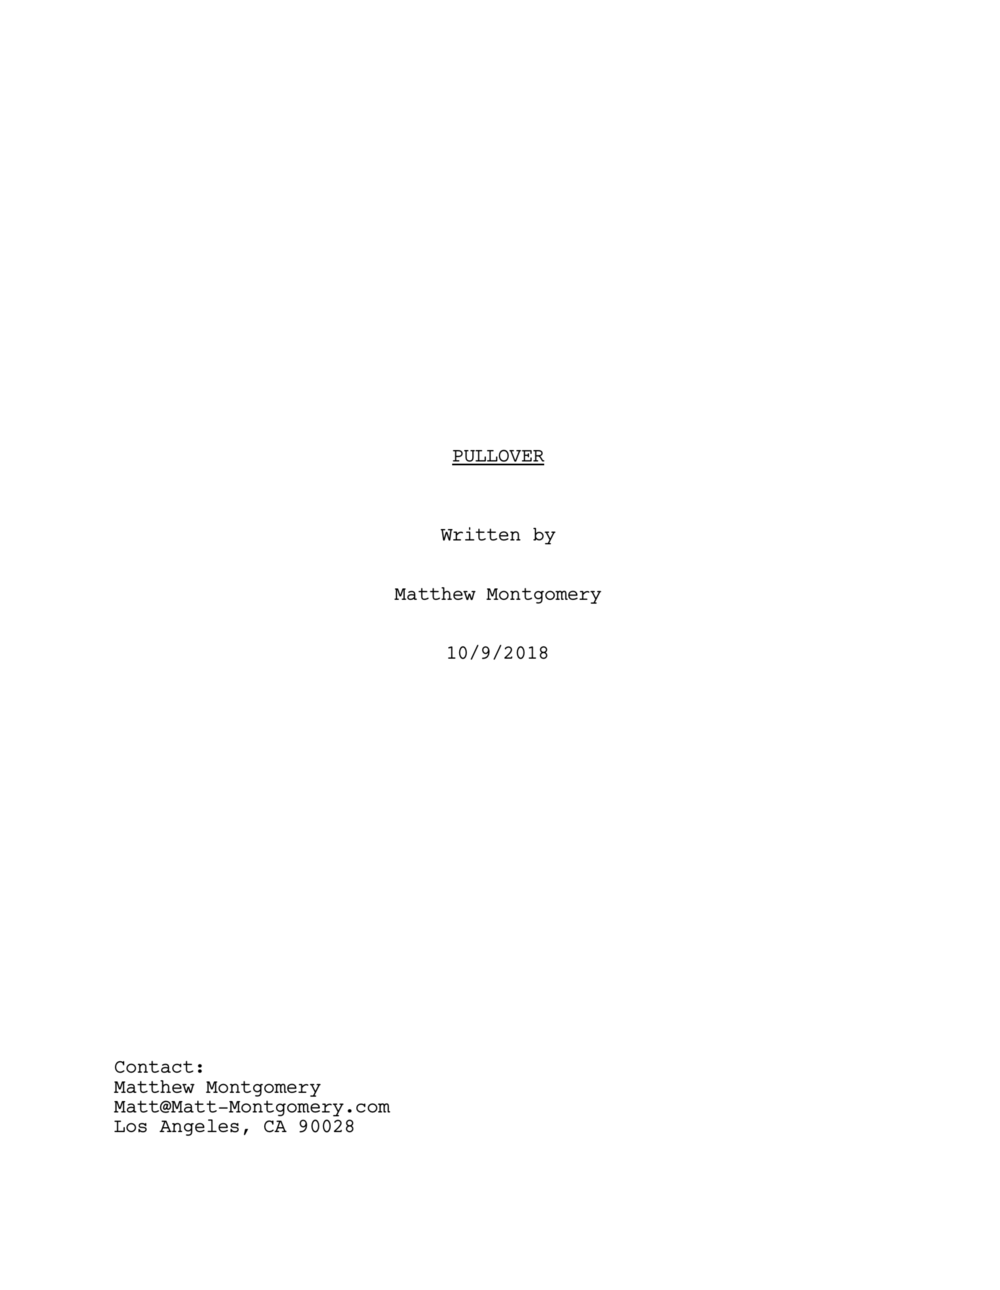 Pullover - Feature Film